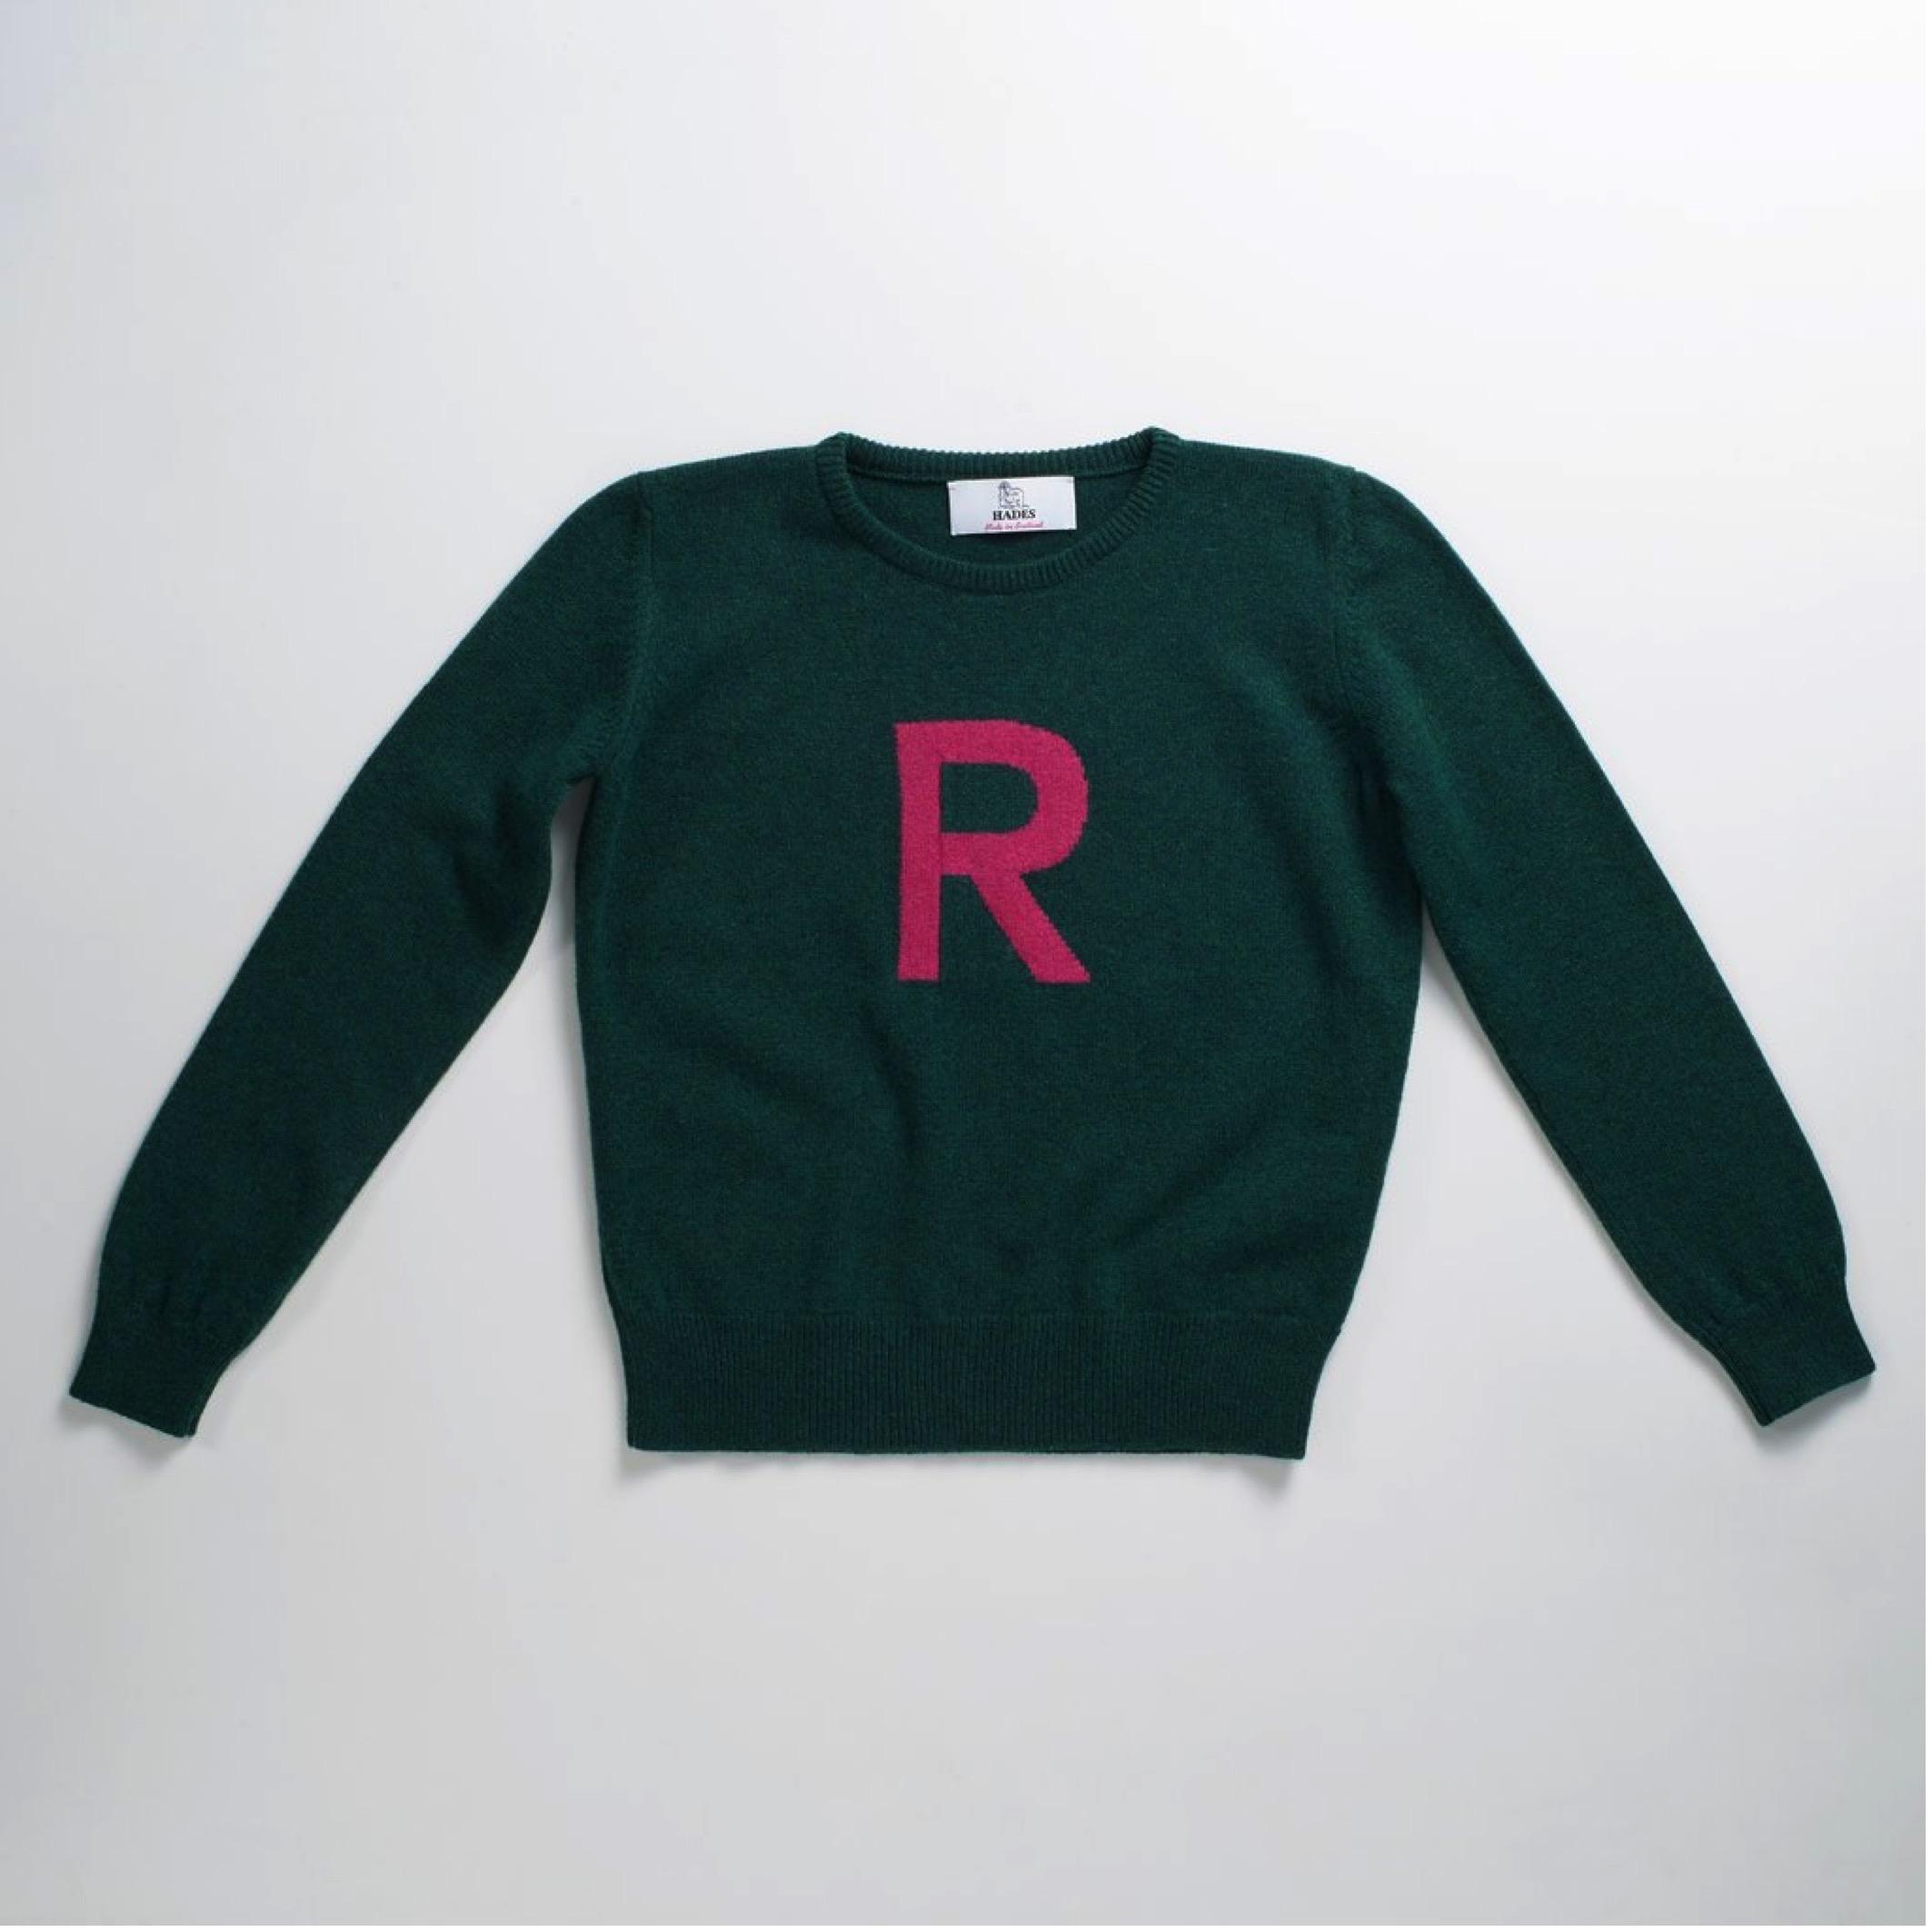 HADES WOOL - Alphabet sweater